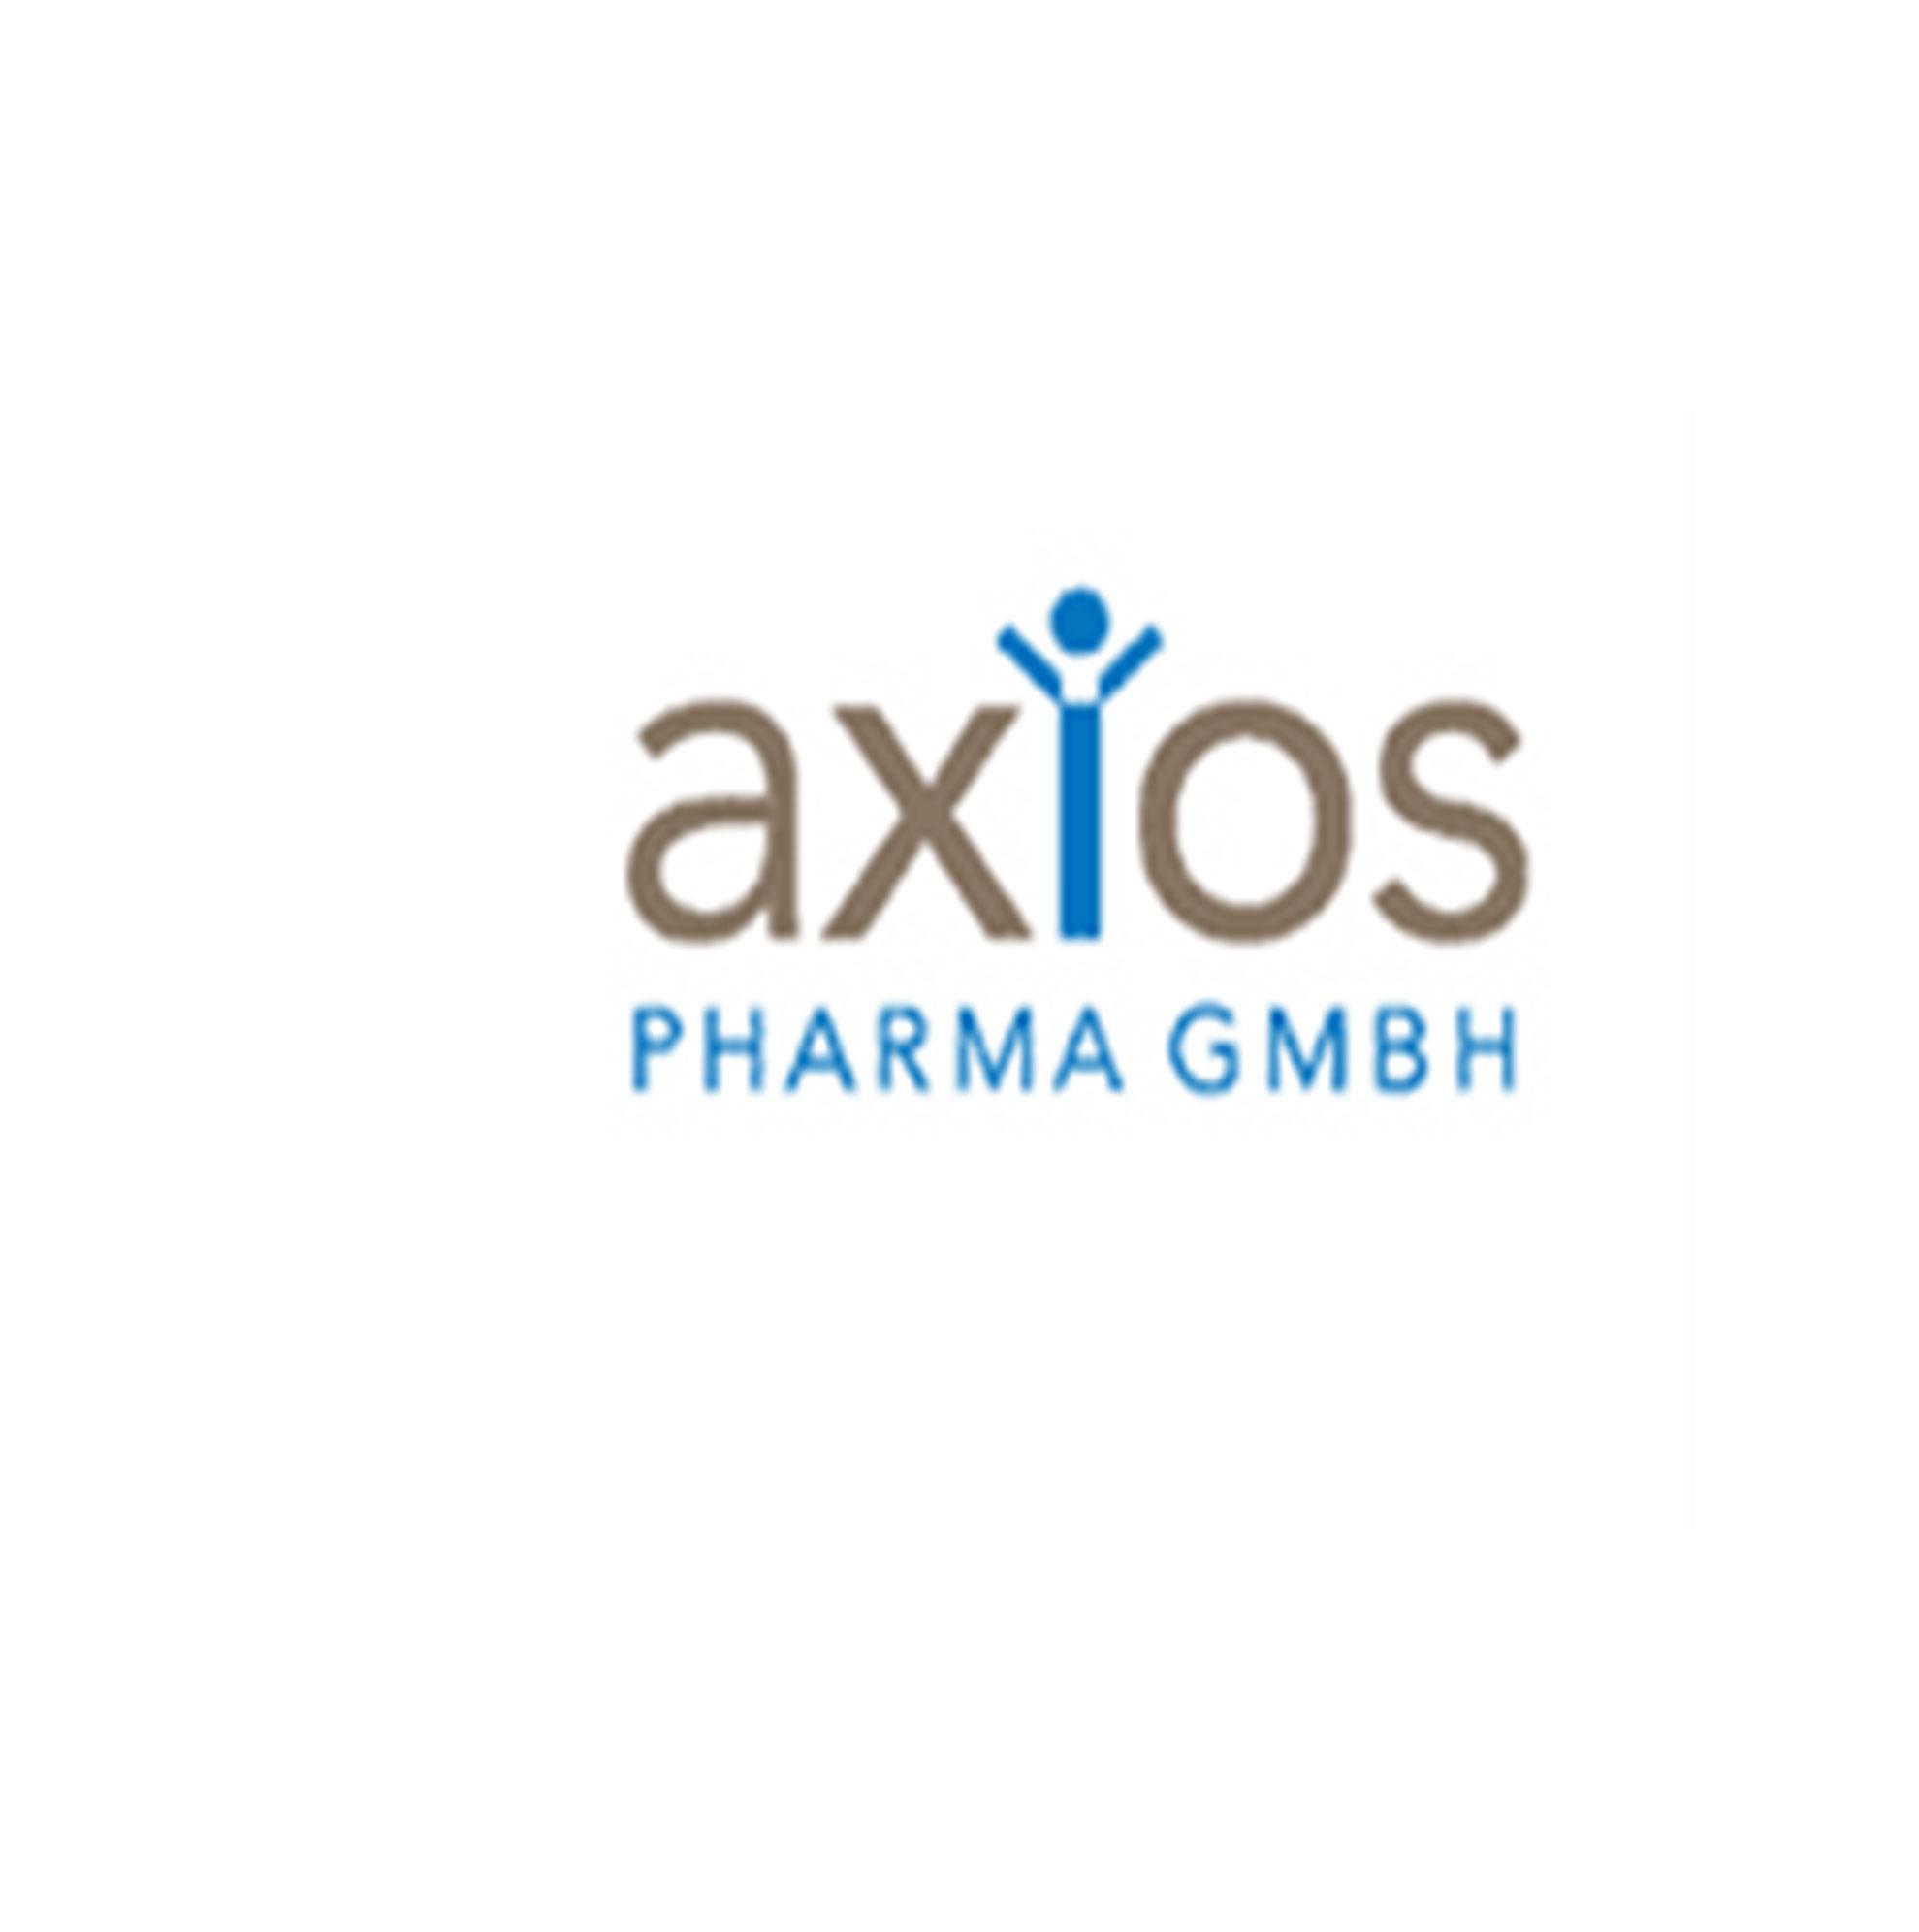 axios PHARMA GmbH